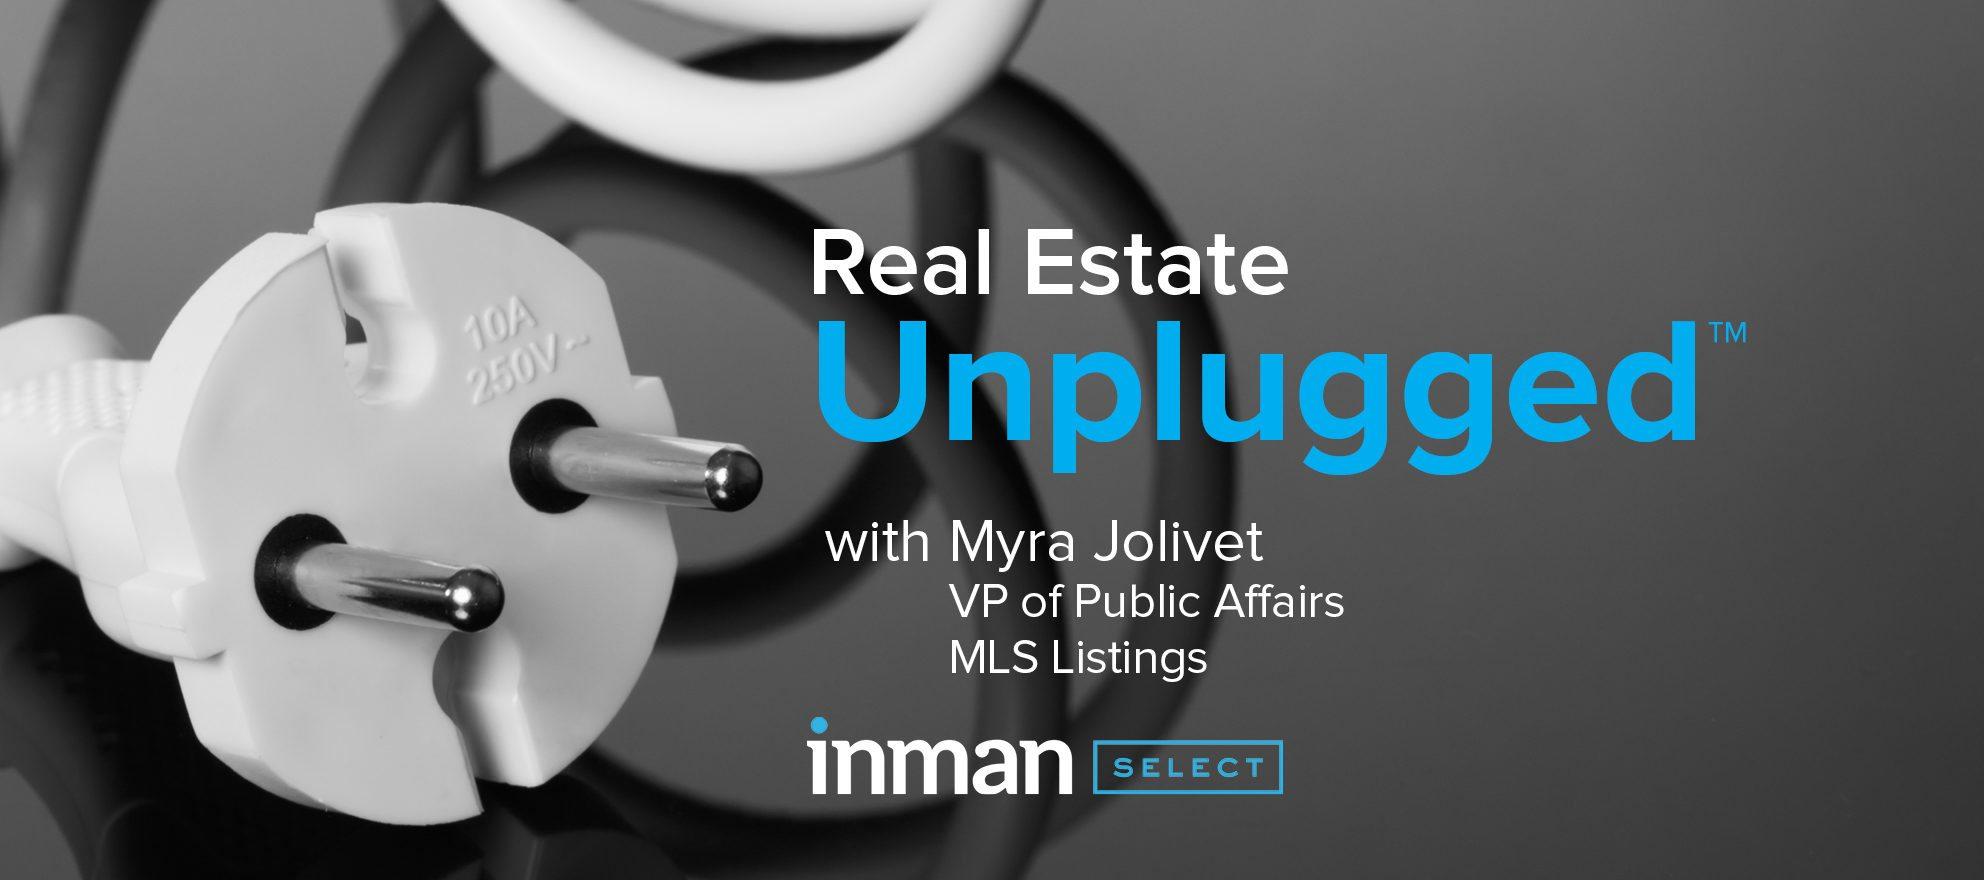 Myra Jolivet on rapid change, new business models and more